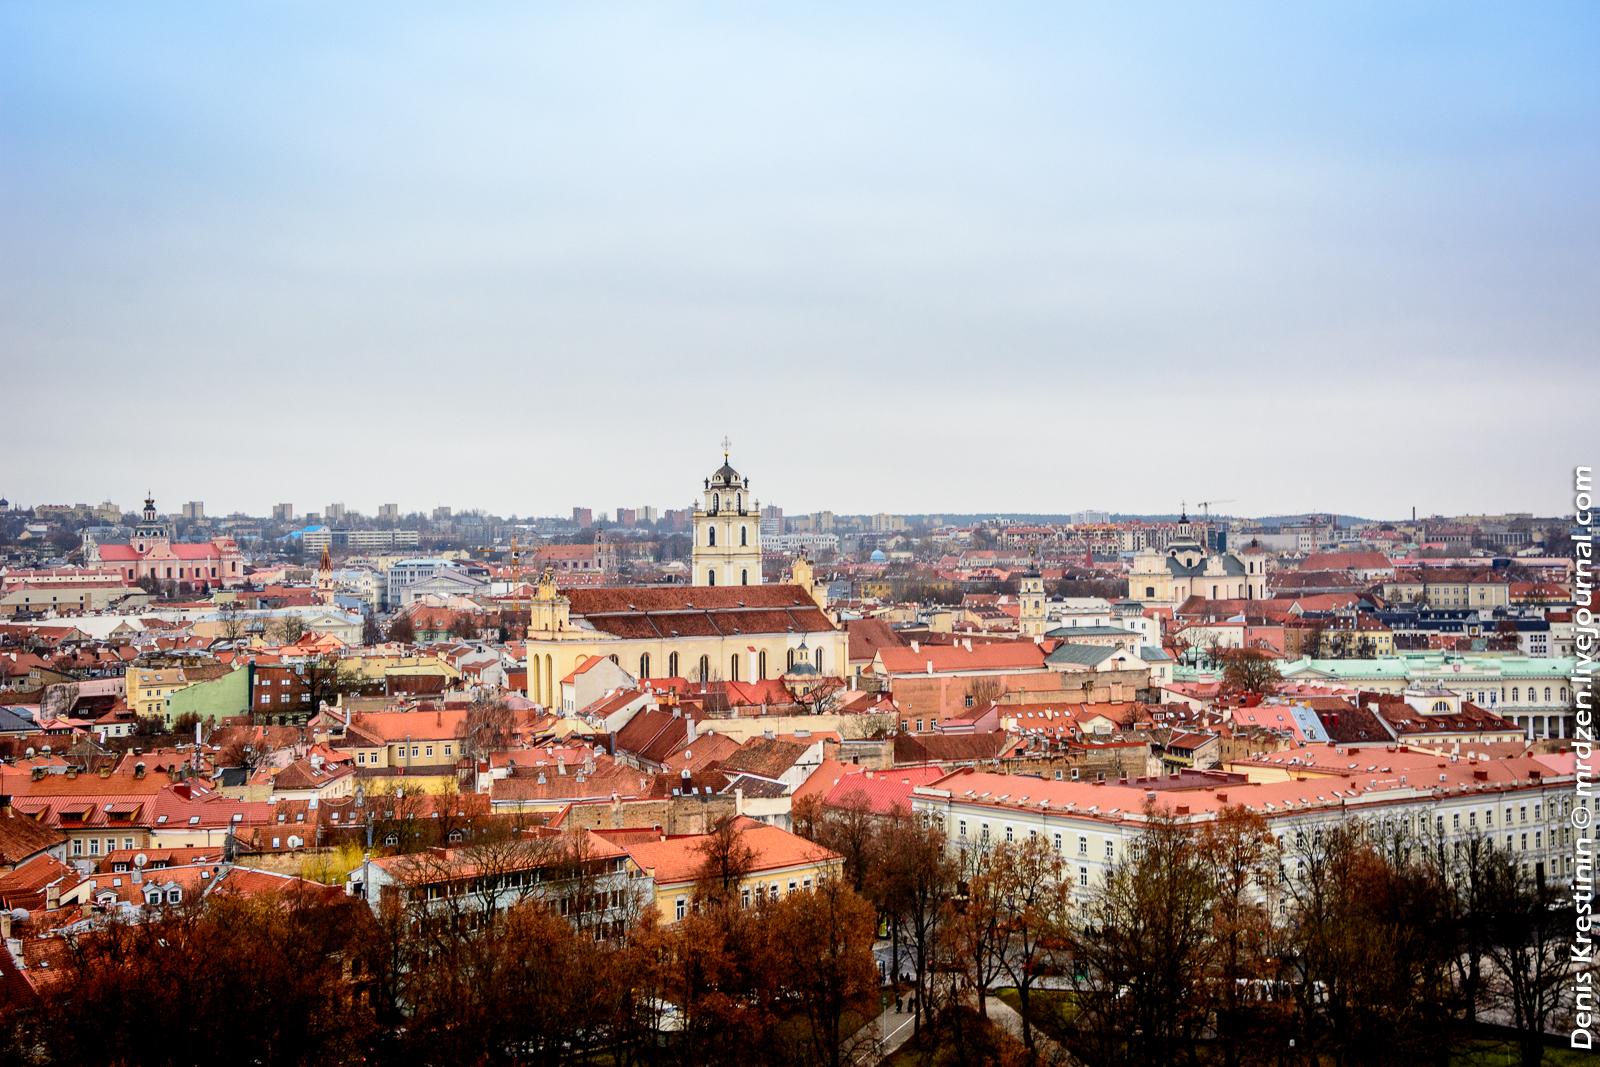 Вильнюс. Замковая гора. Вид на Старый город.